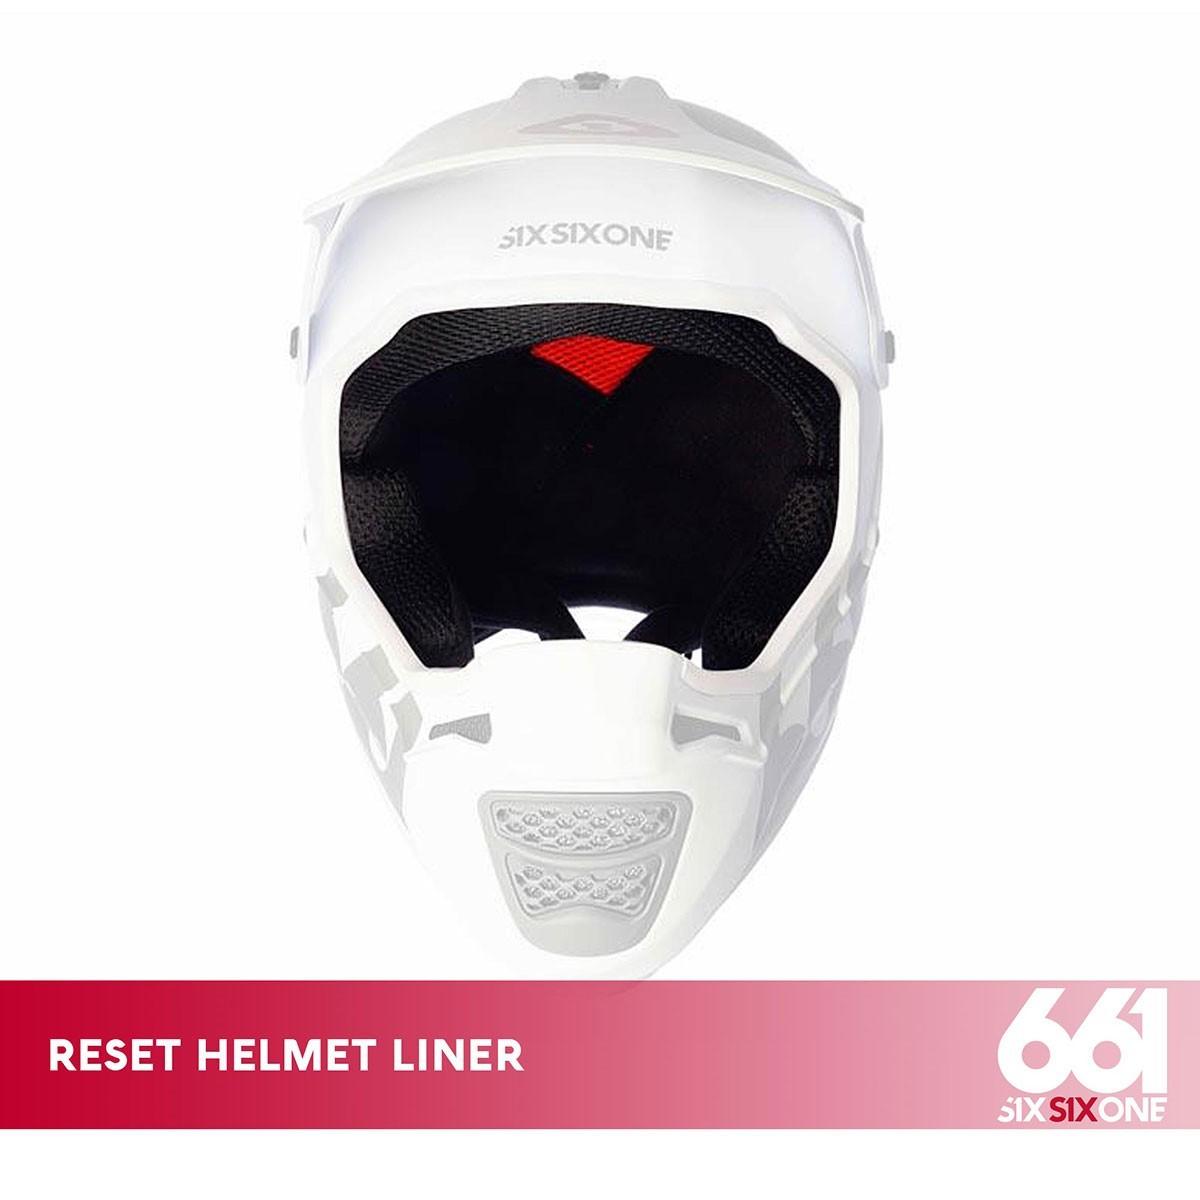 661 RESET LINER - Изображение - AQUAMATRIX